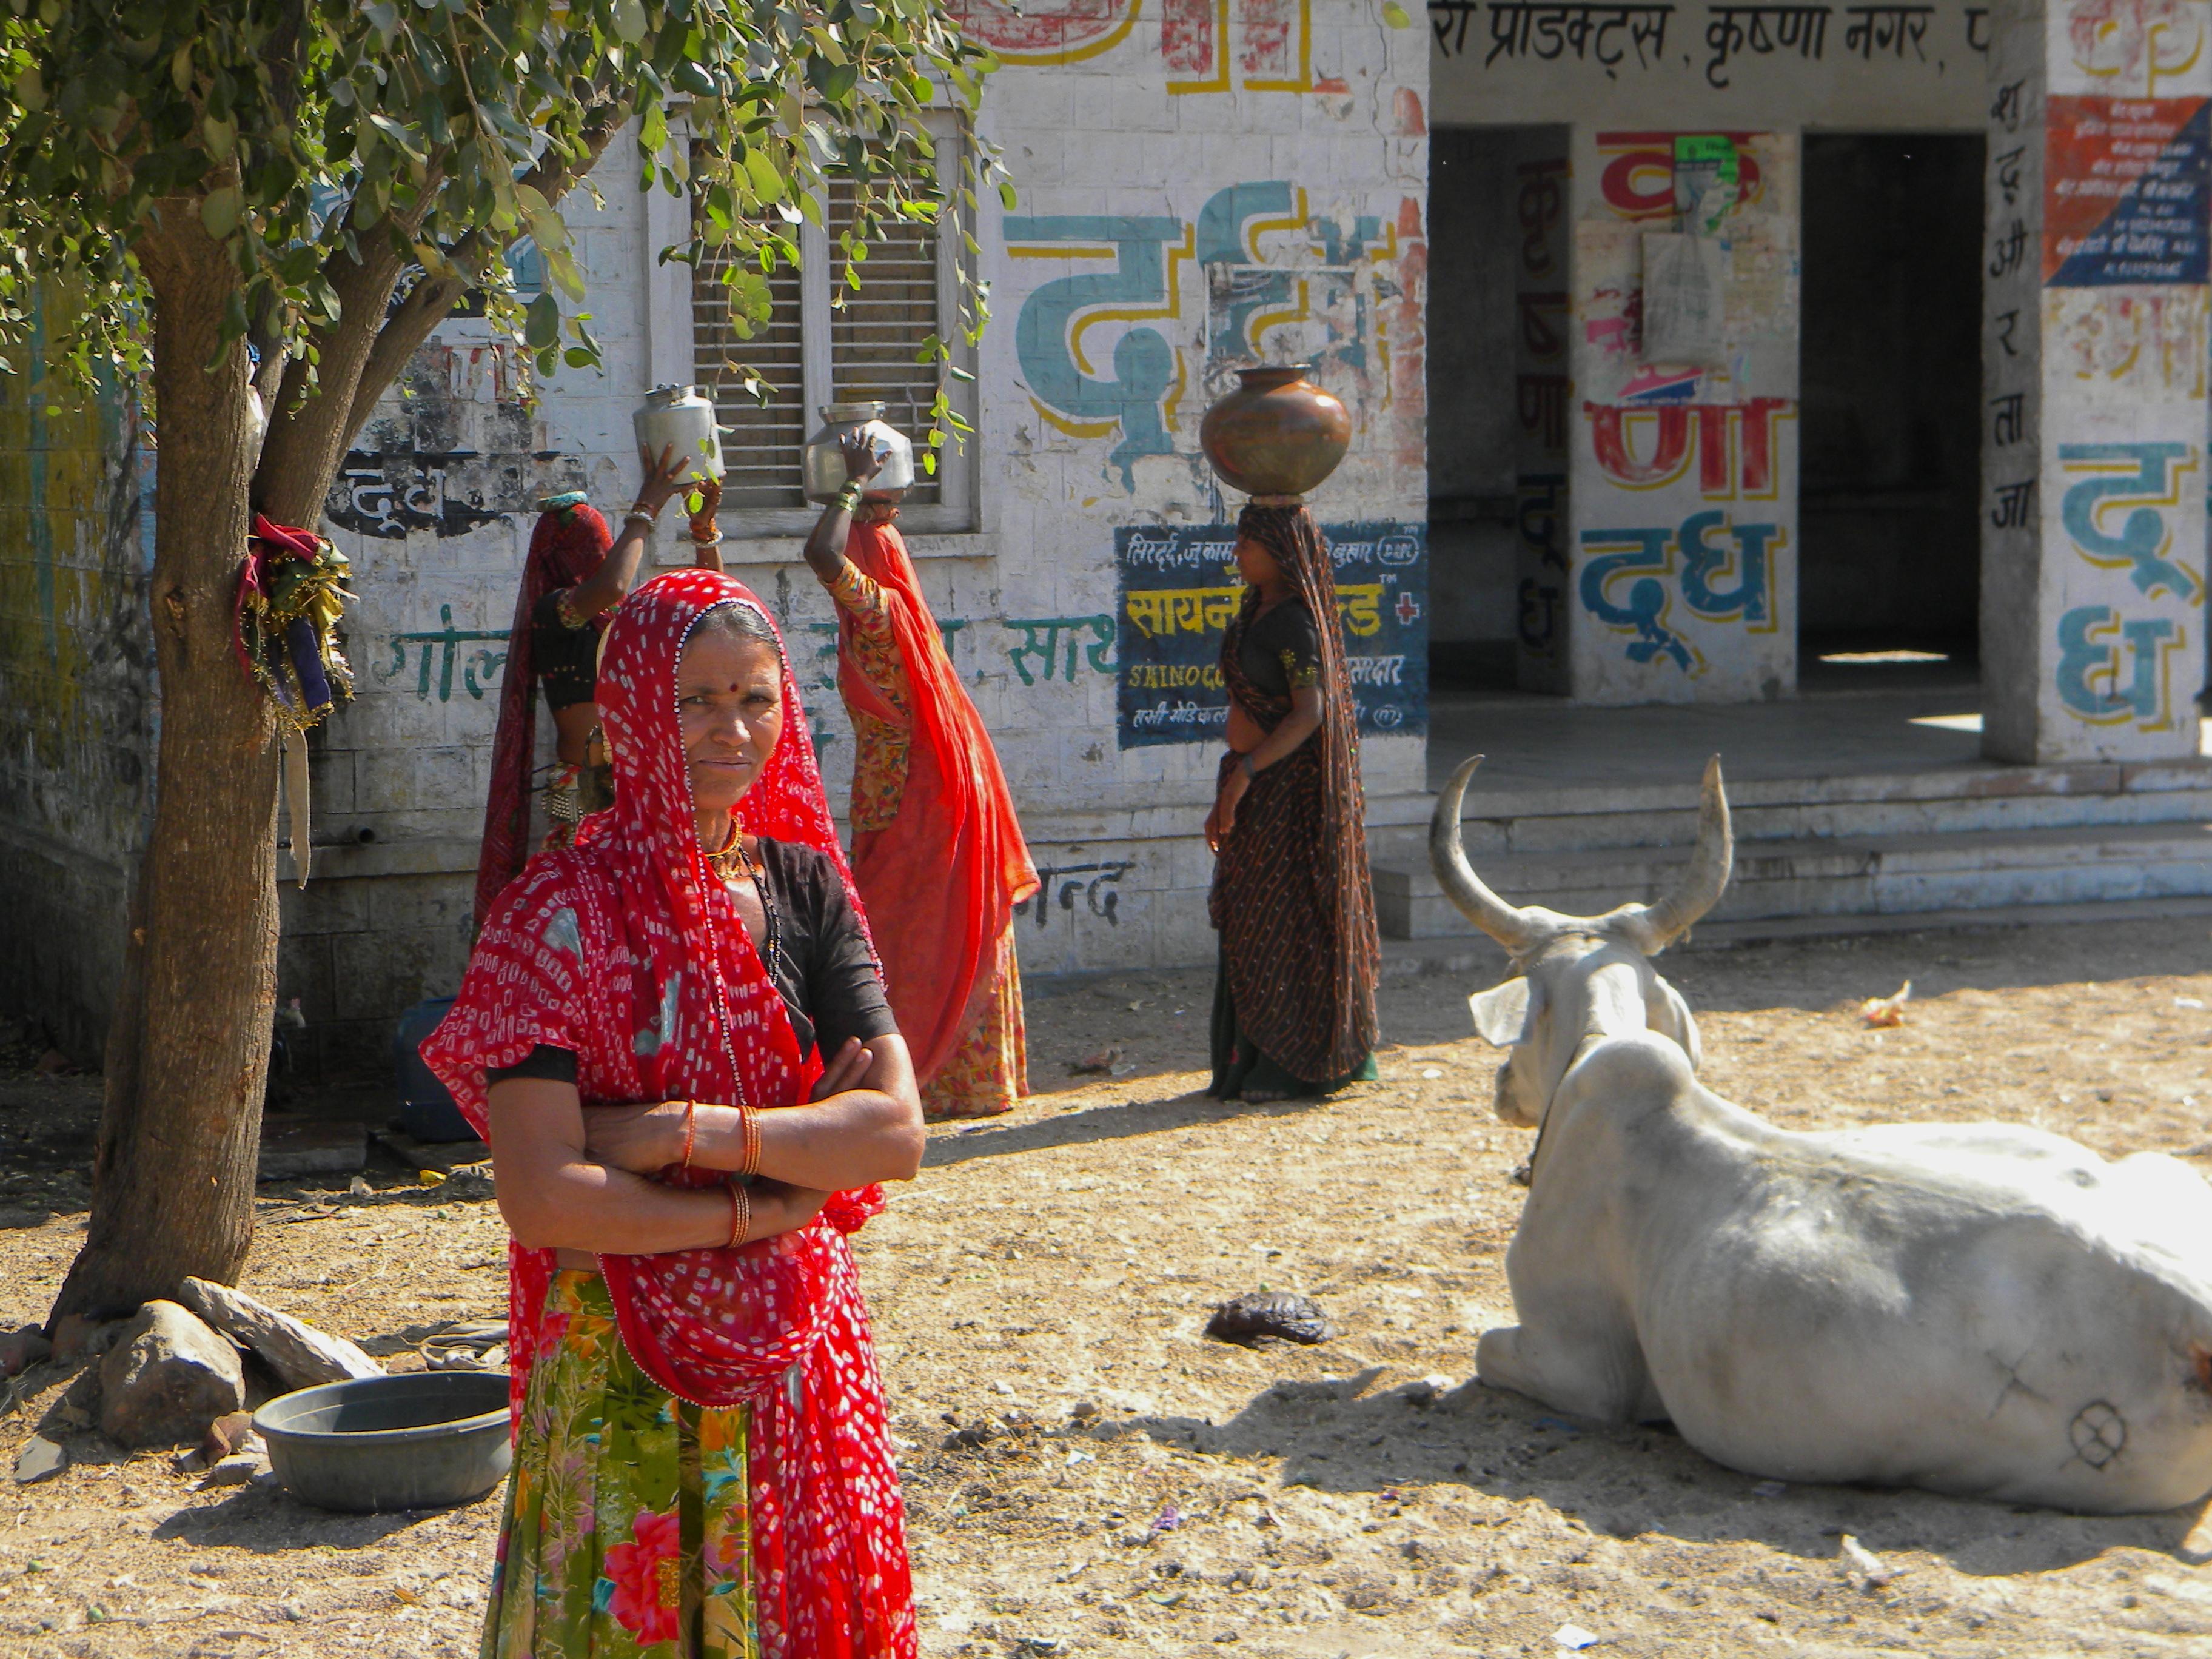 At Home, India 2010